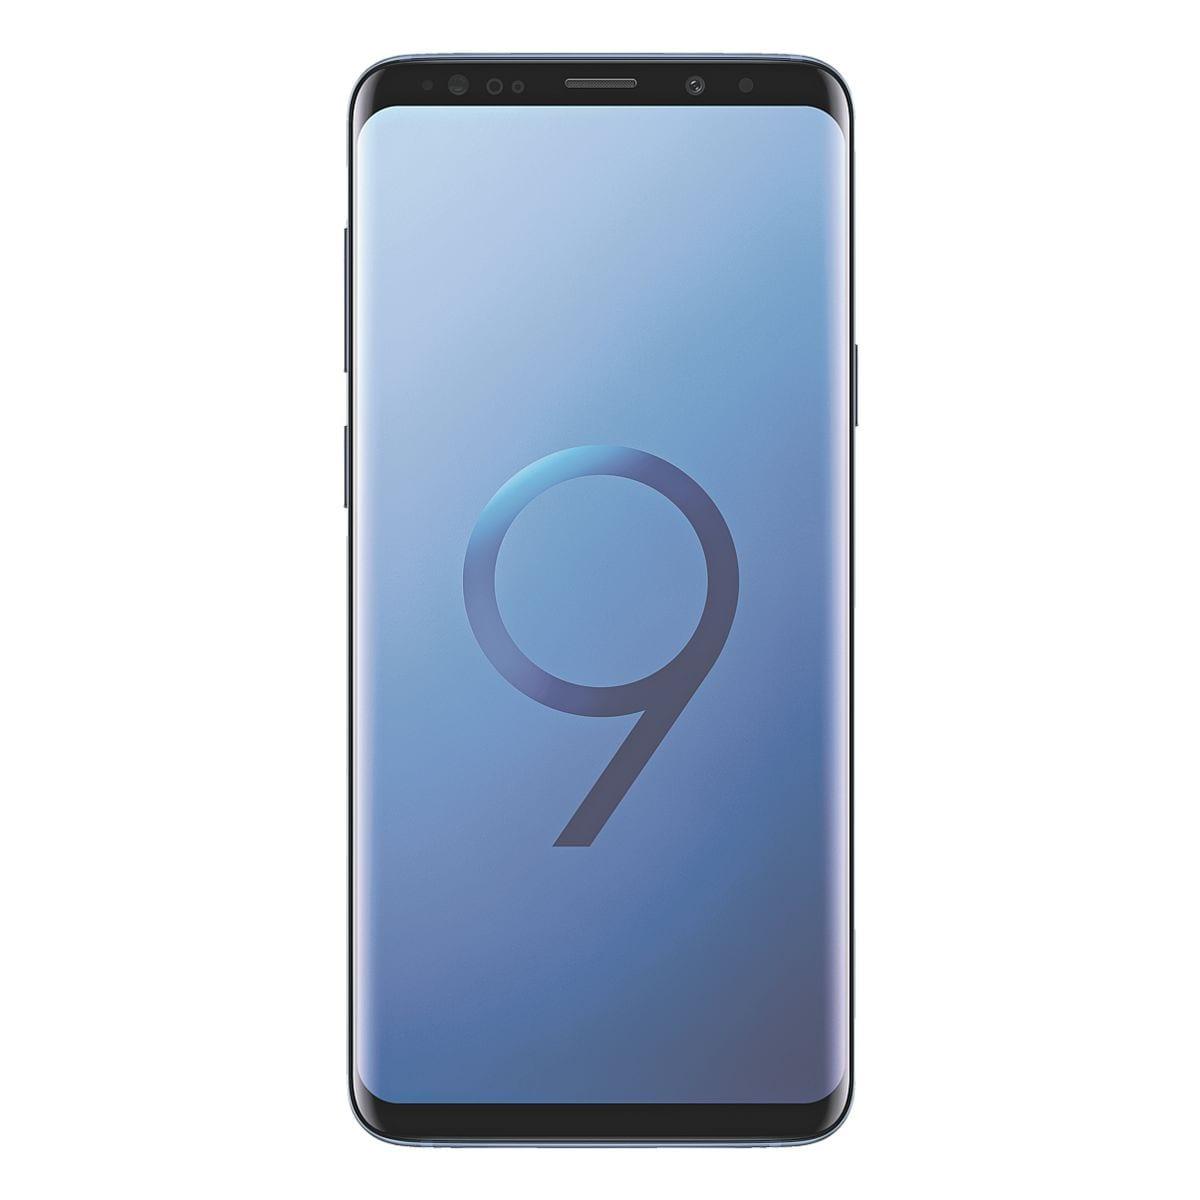 Samsung Smartphone »Galaxy S9+« 64 GB Coral Blue